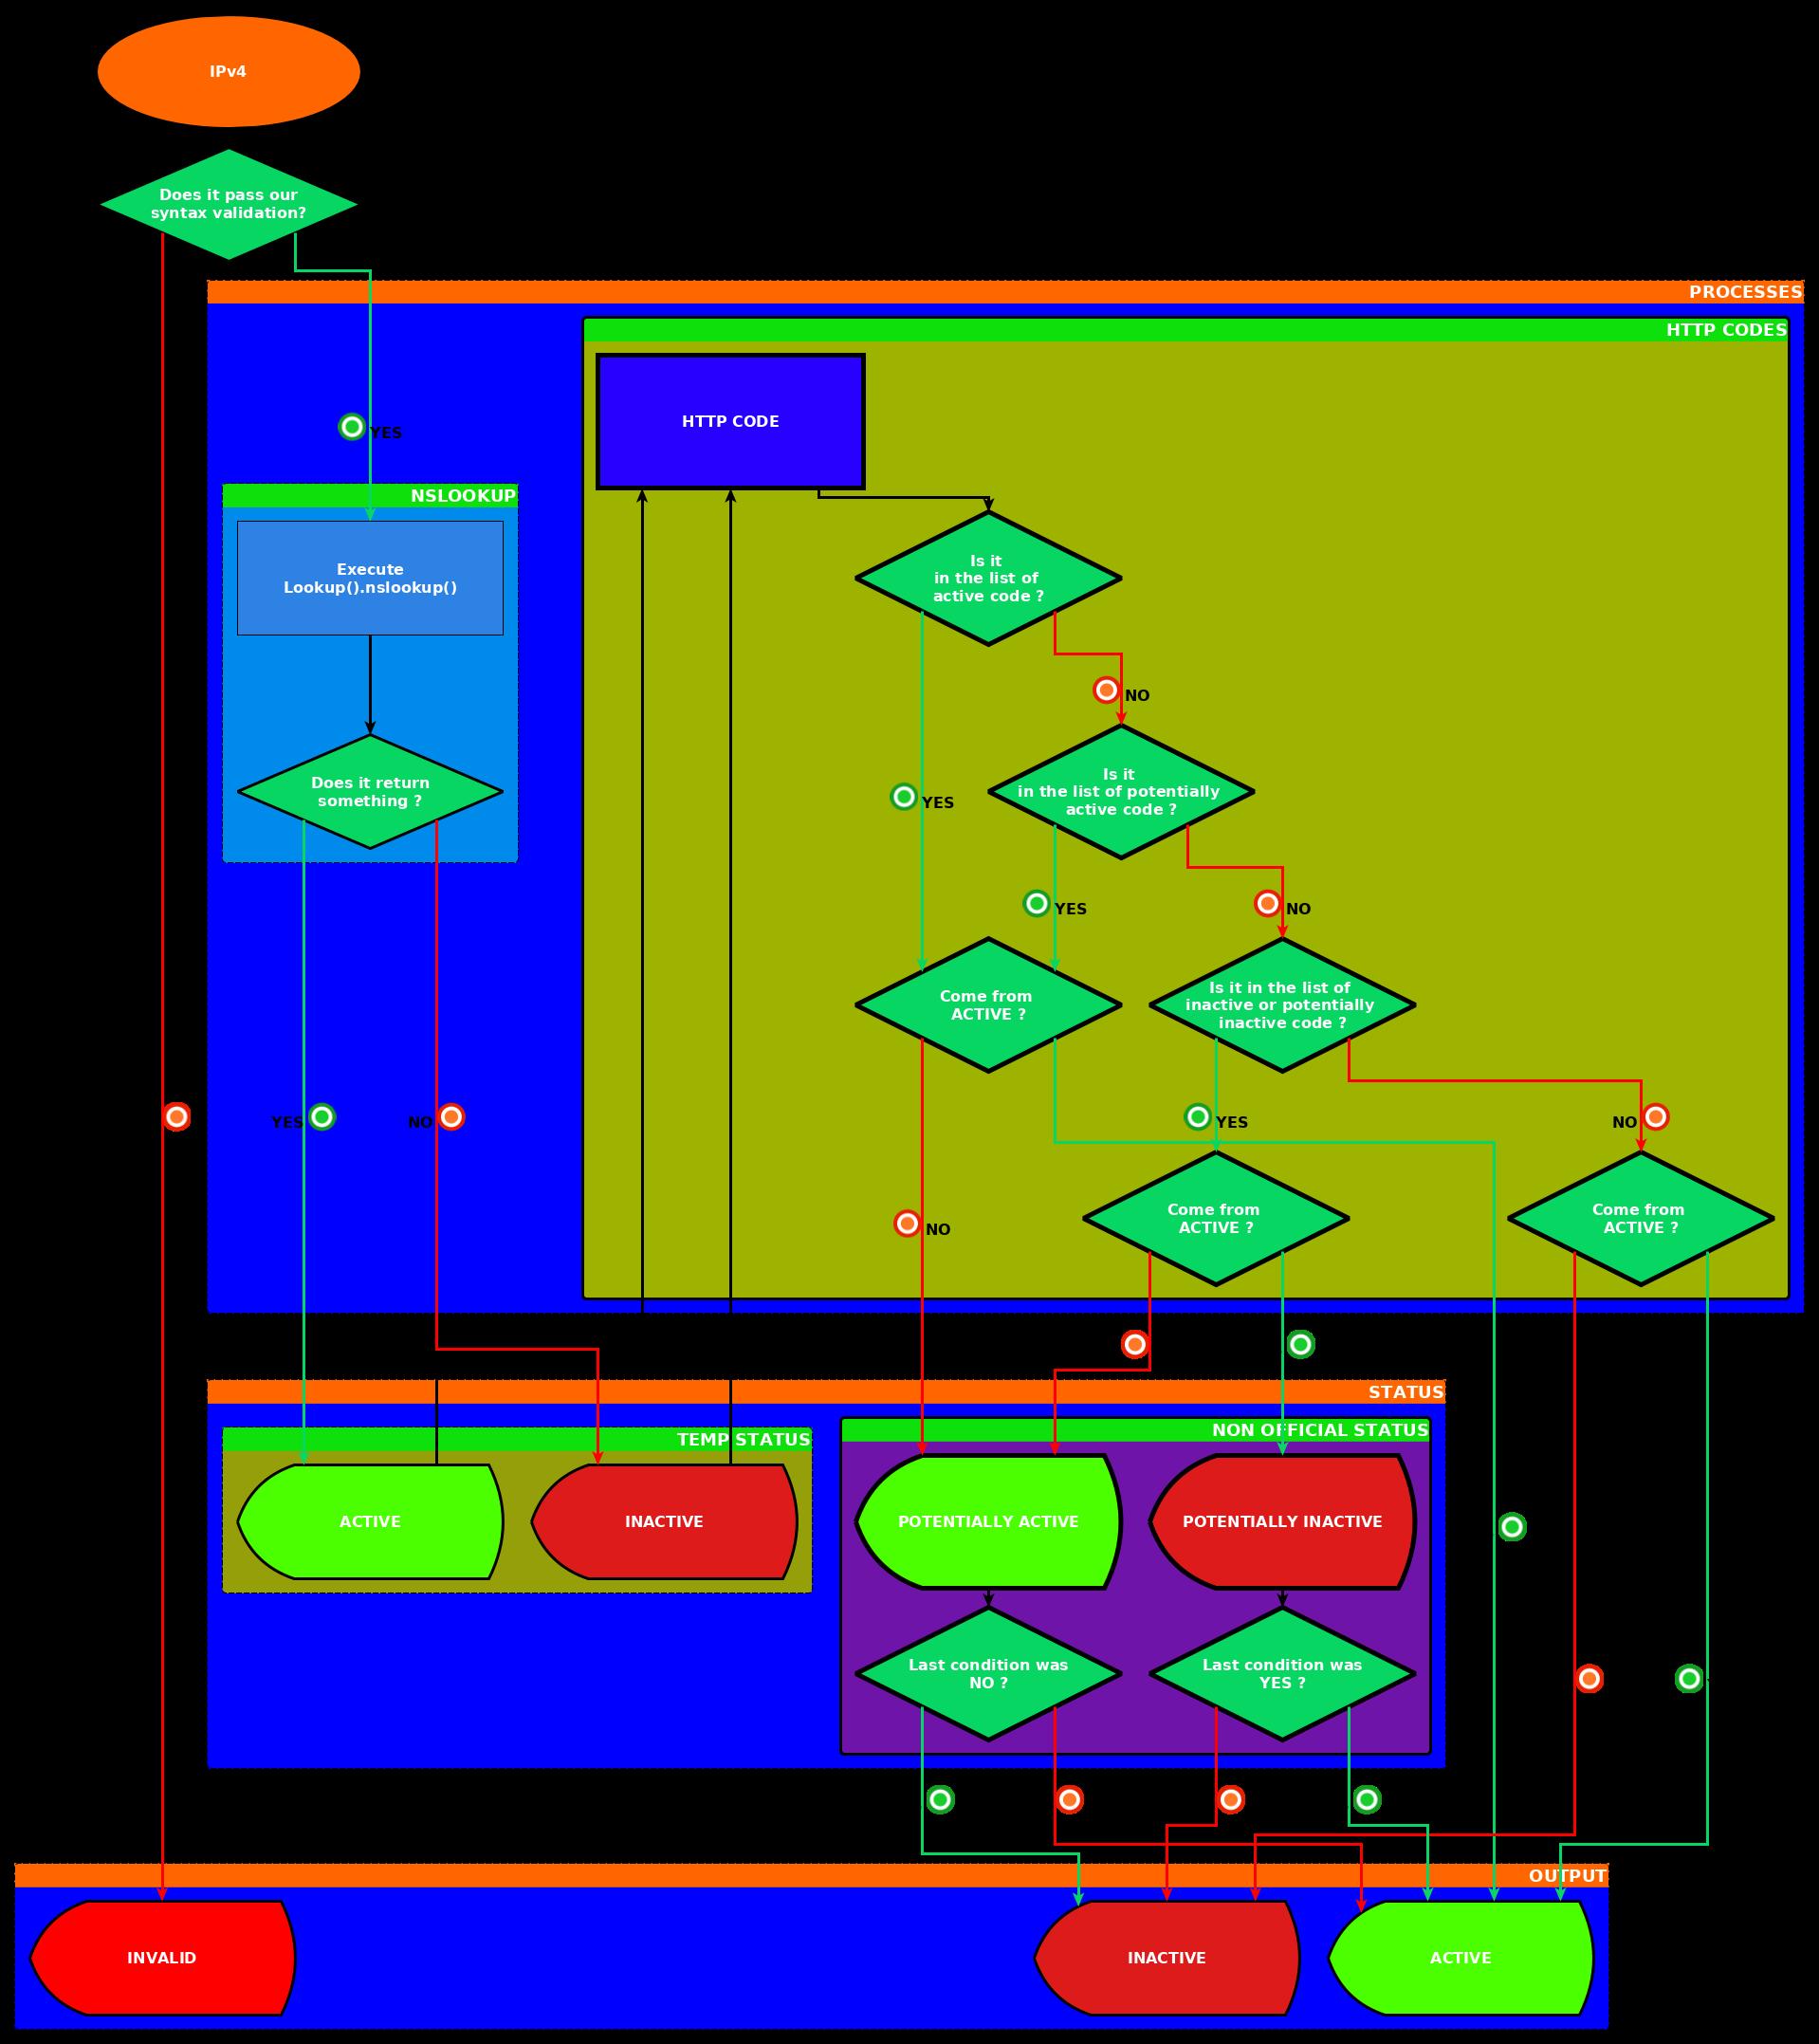 PyFunceble Logic representation for IP testing